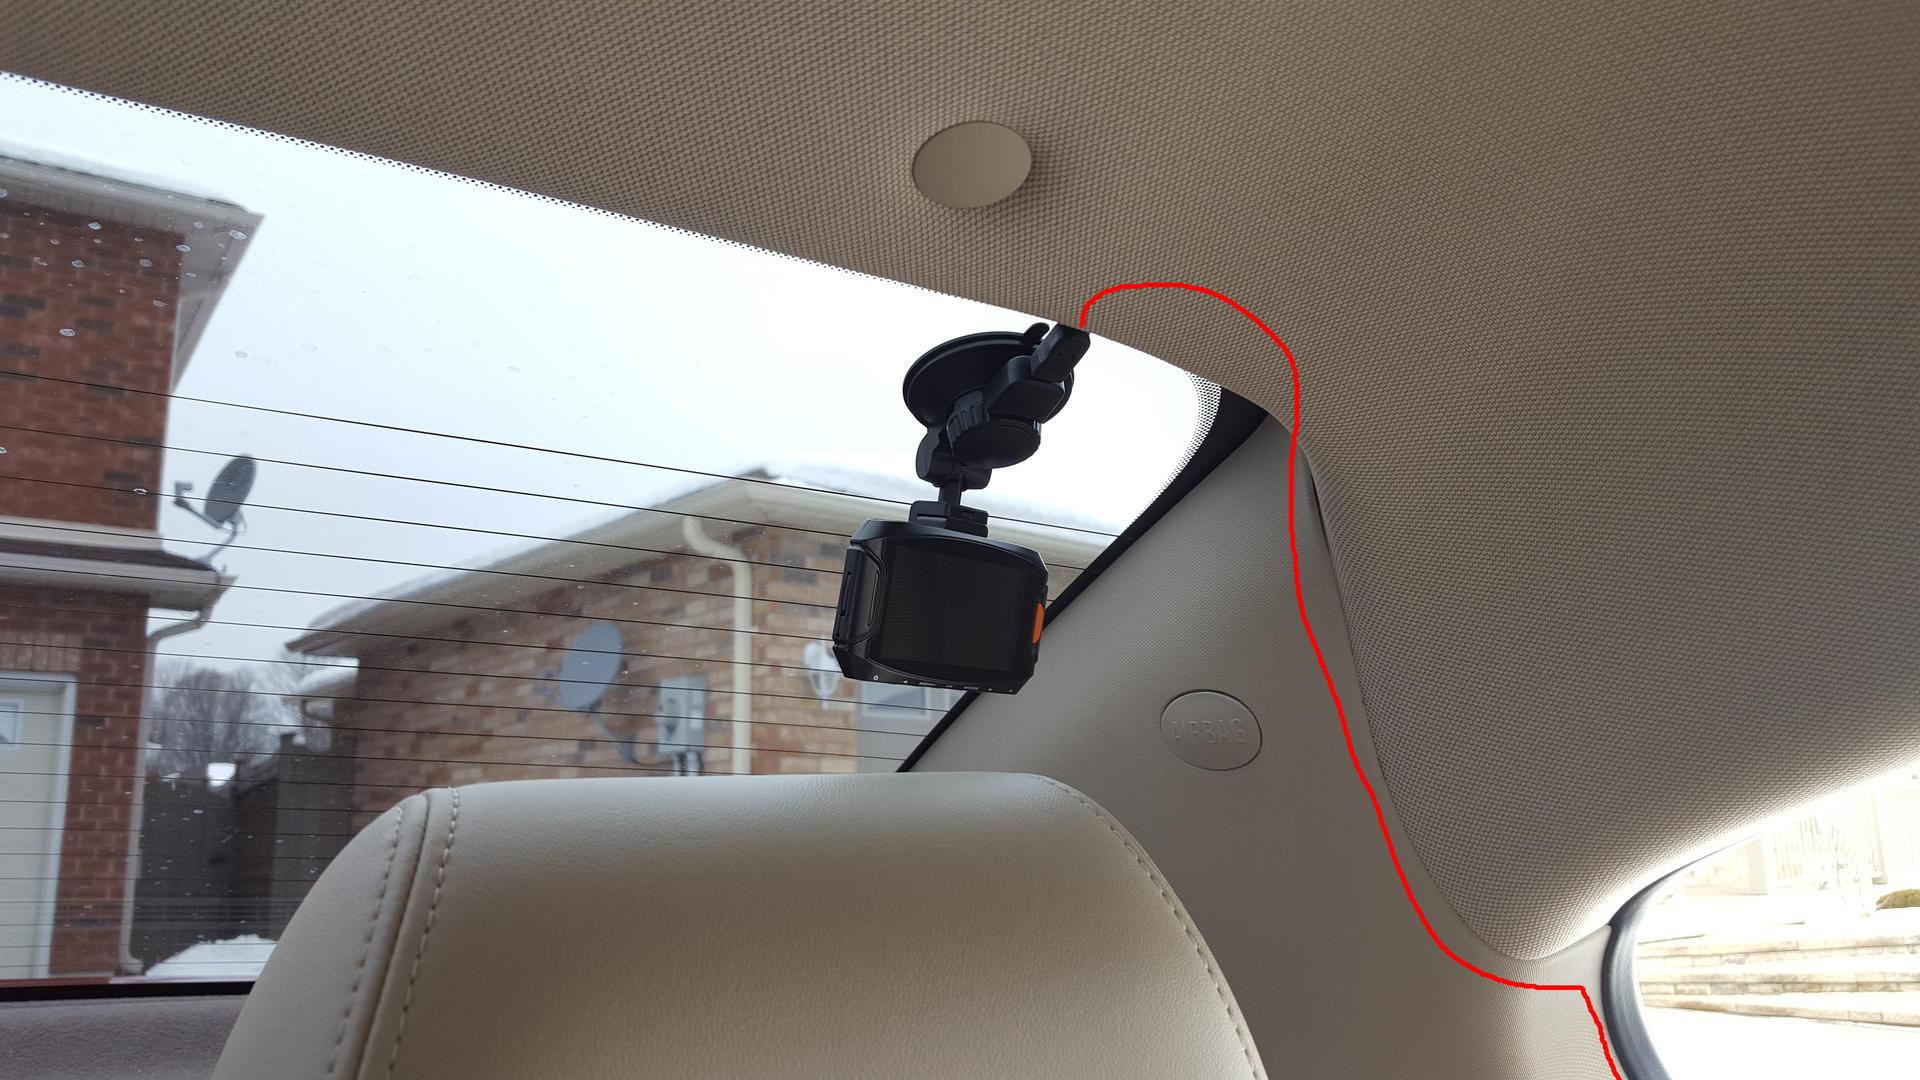 Dash Camera Hardwiring With Power Magic Pro 2011 Chevy Cruze Fuse Box 20160130 134302